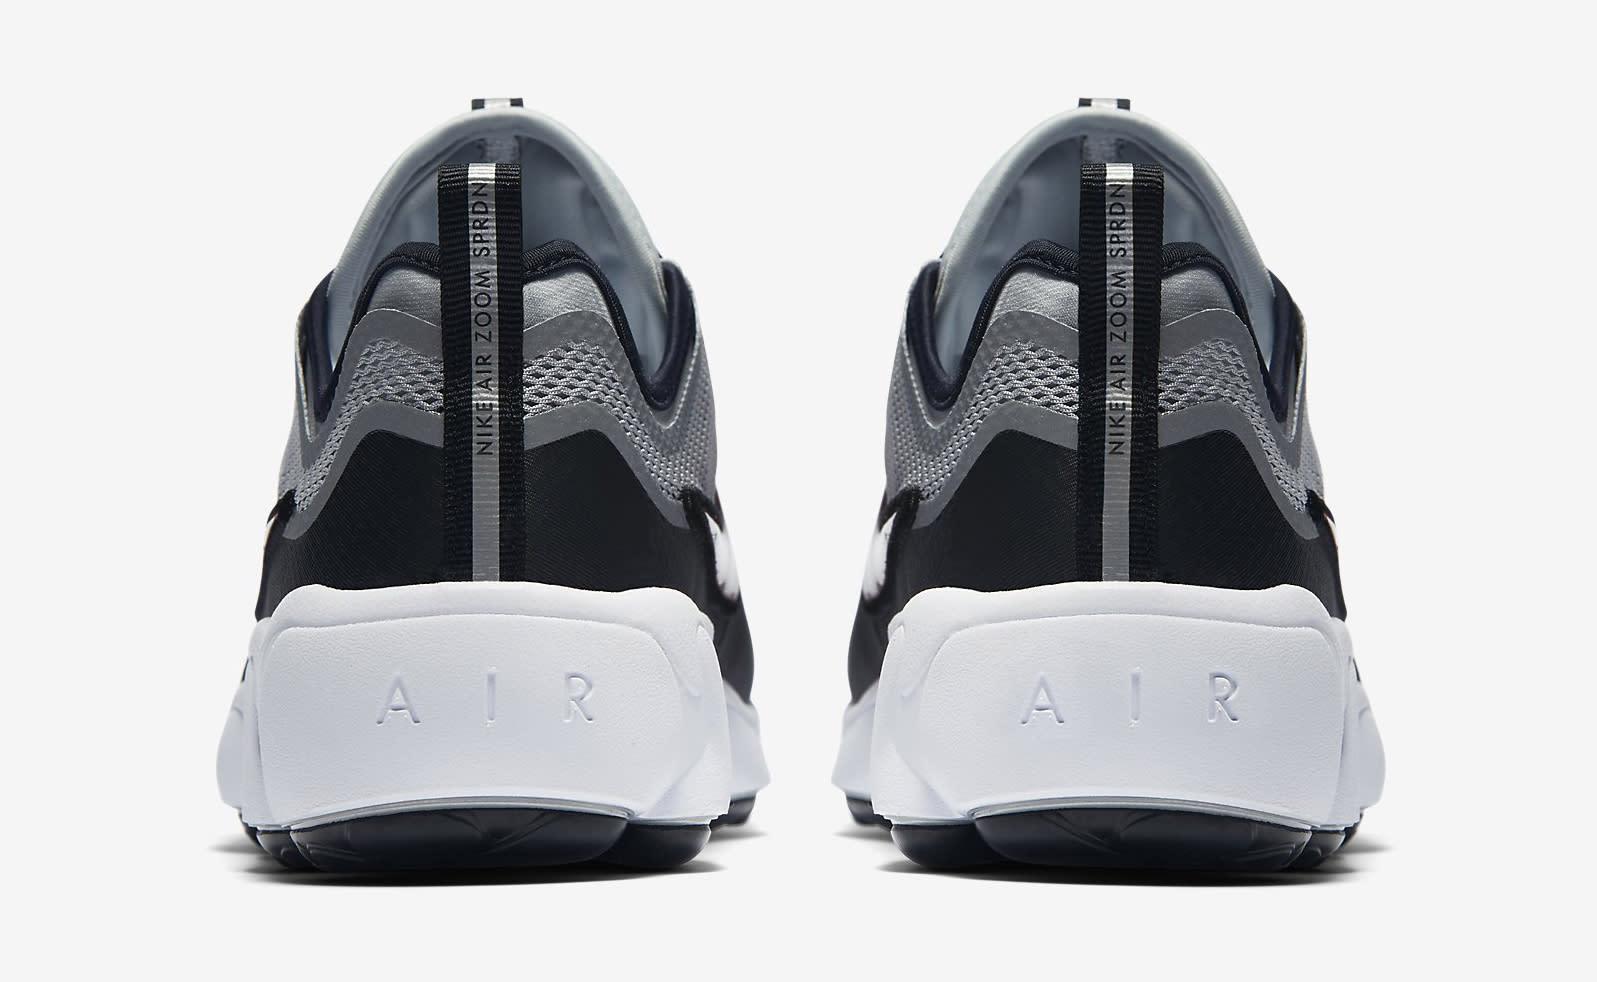 Nike Air Zoom Spiridon Ultra OG 876267-001 Heel